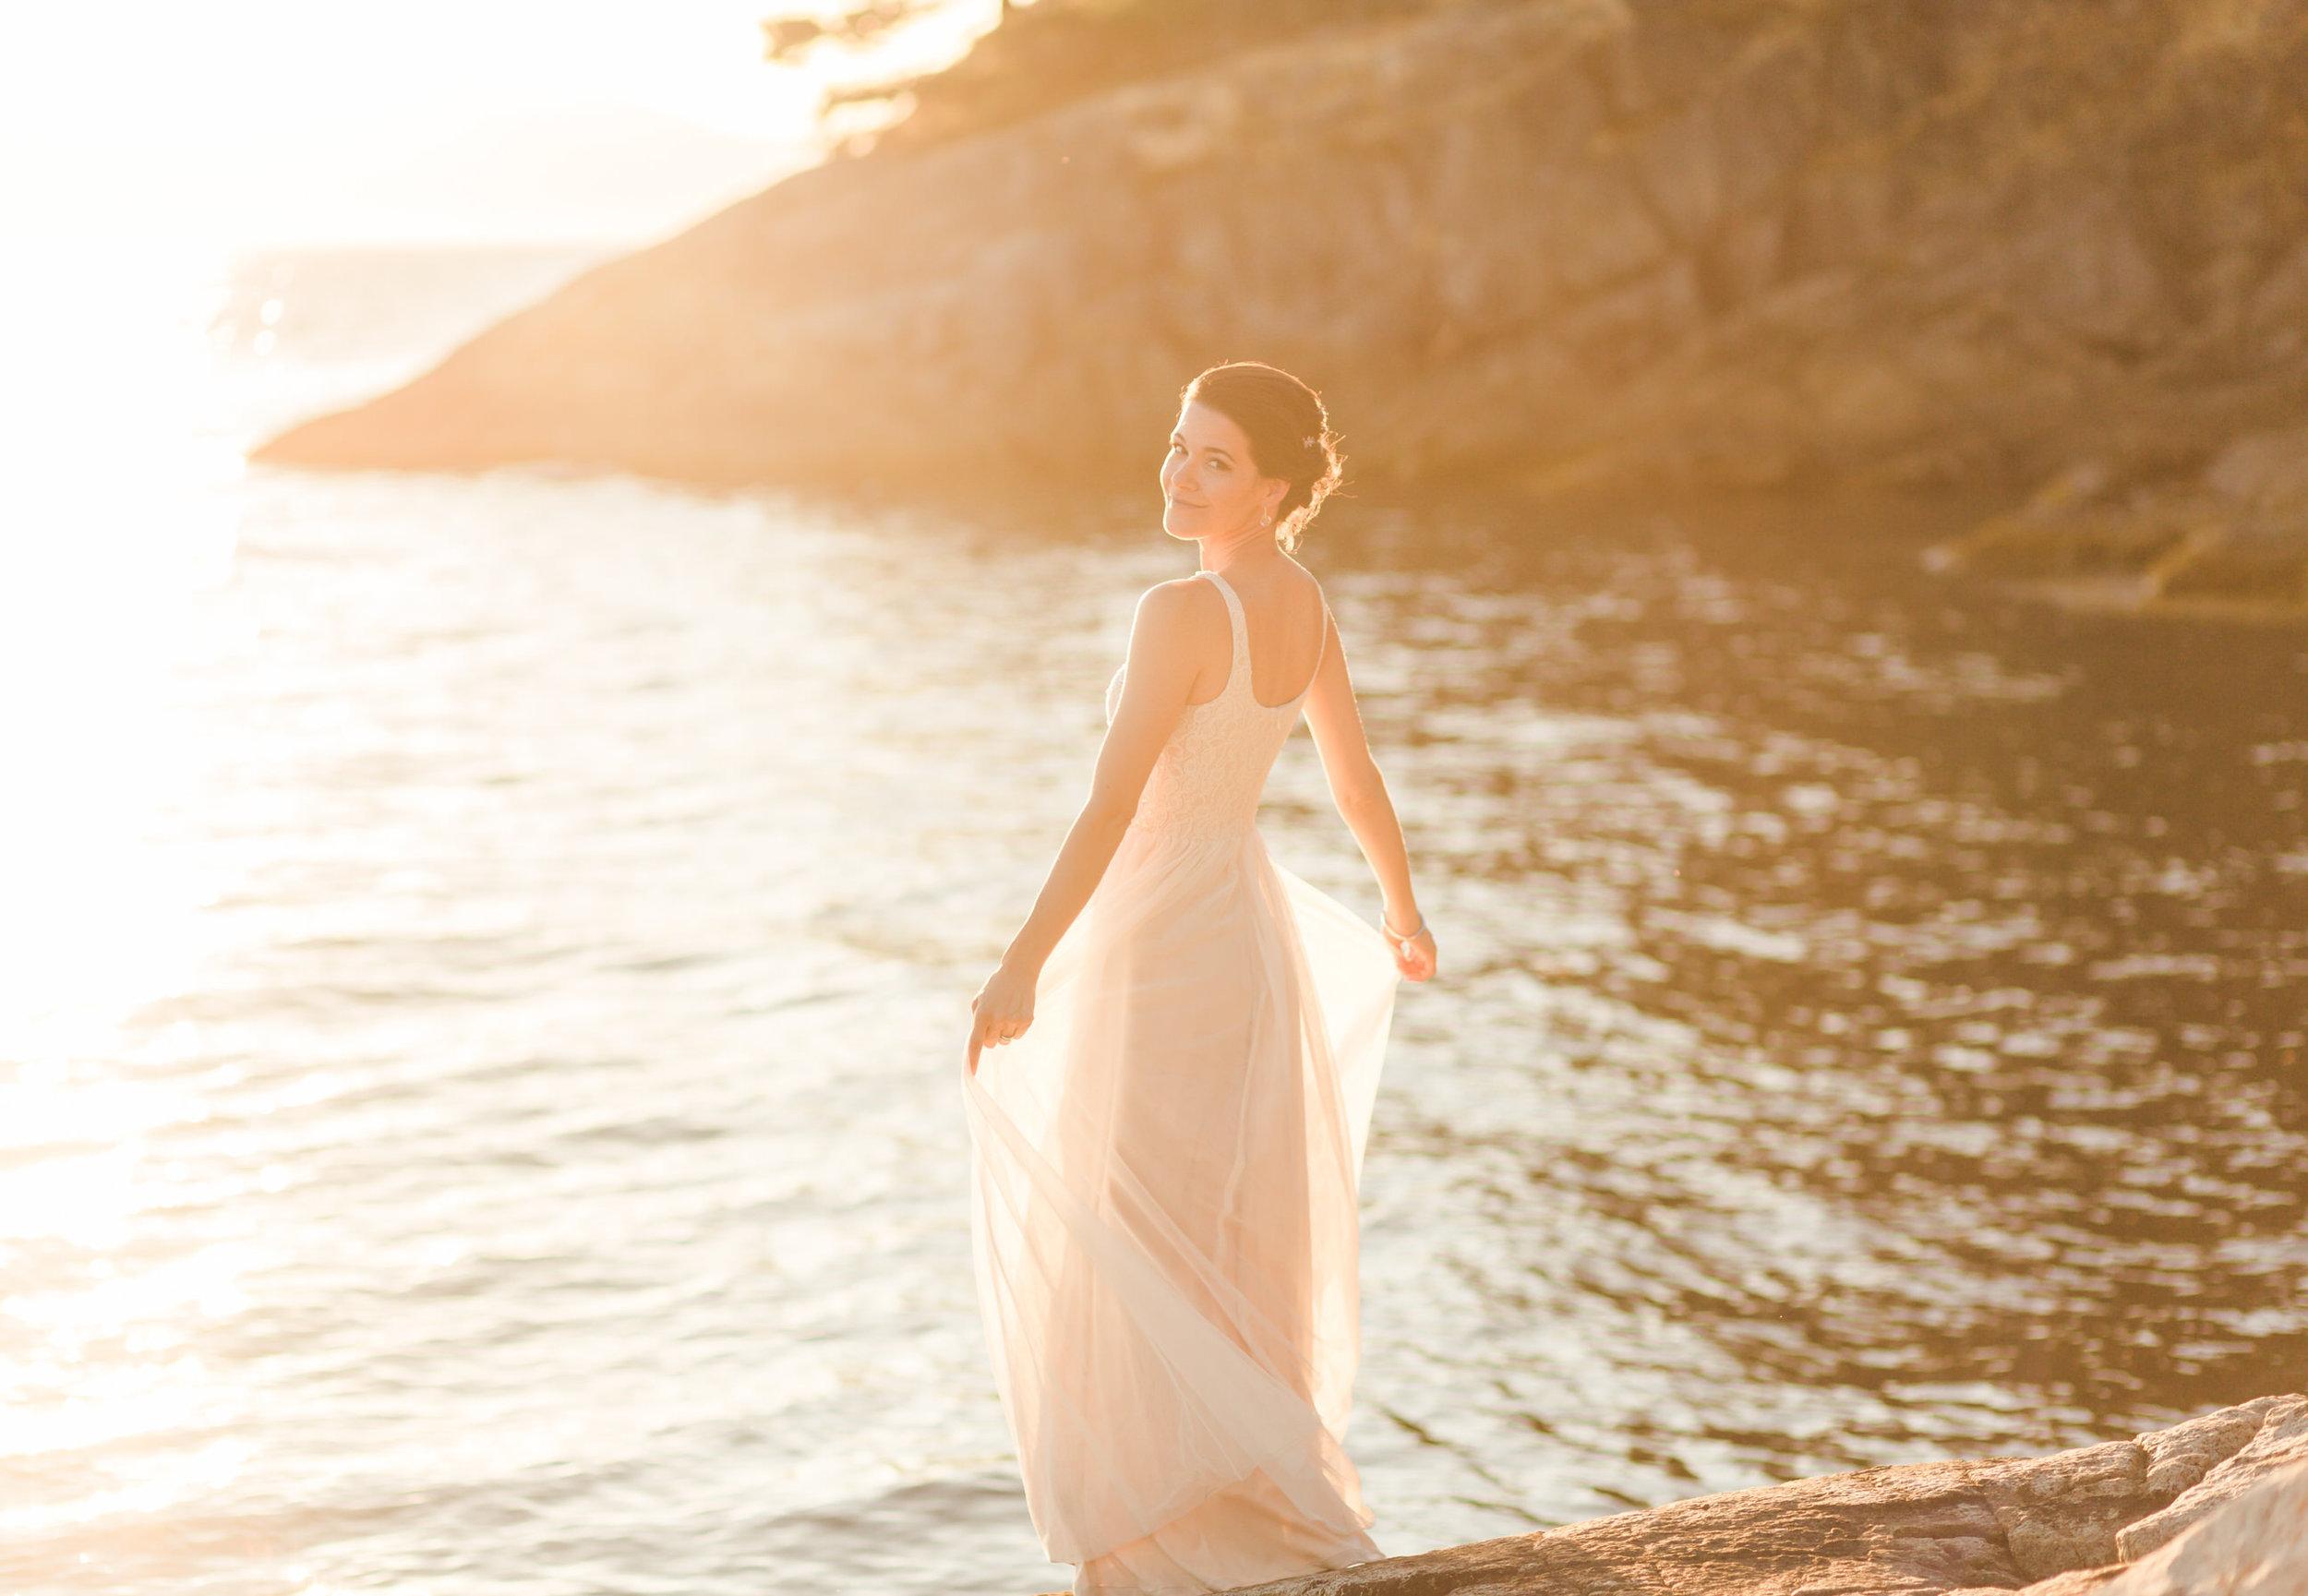 Rockwater Secret Cove Resort Wedding - Sunshine Coast BC Wedding Photographer - Vancouver Wedding Photographer - Sunshine Coast Elopement Photos - IMG_1953.jpg